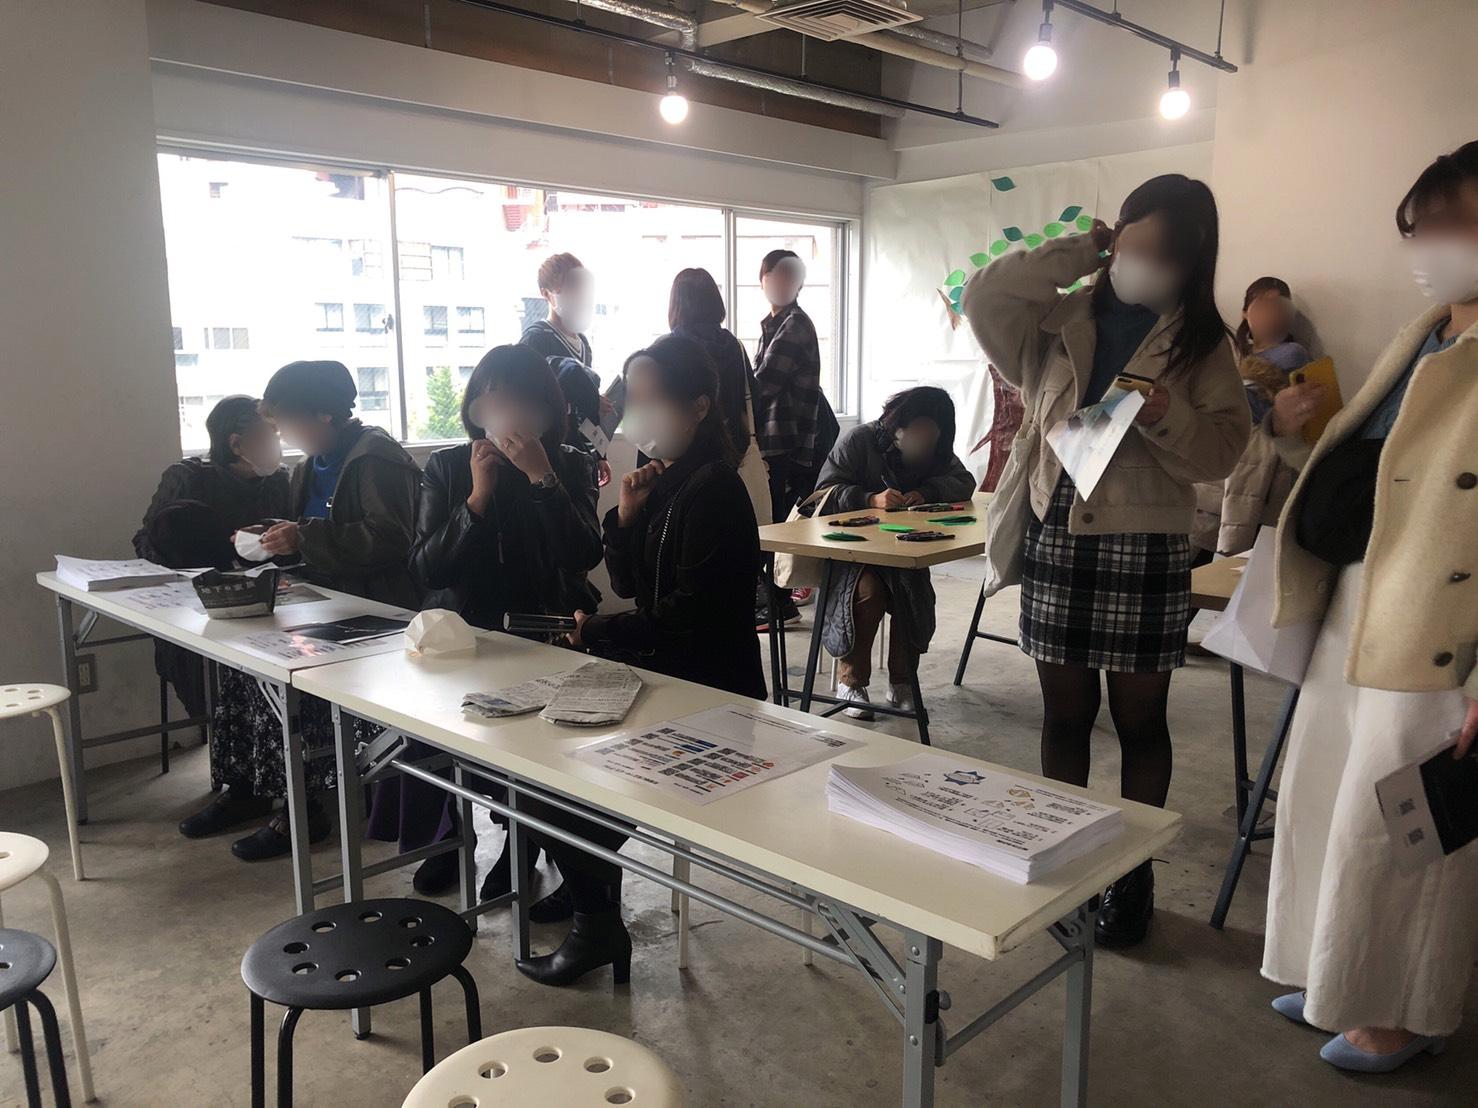 Creator's District 神保町で関東大震災写真展を開催|TIME SHARING|タイムシェアリング|スペースマネジメント|あどばる|adval|SHARING